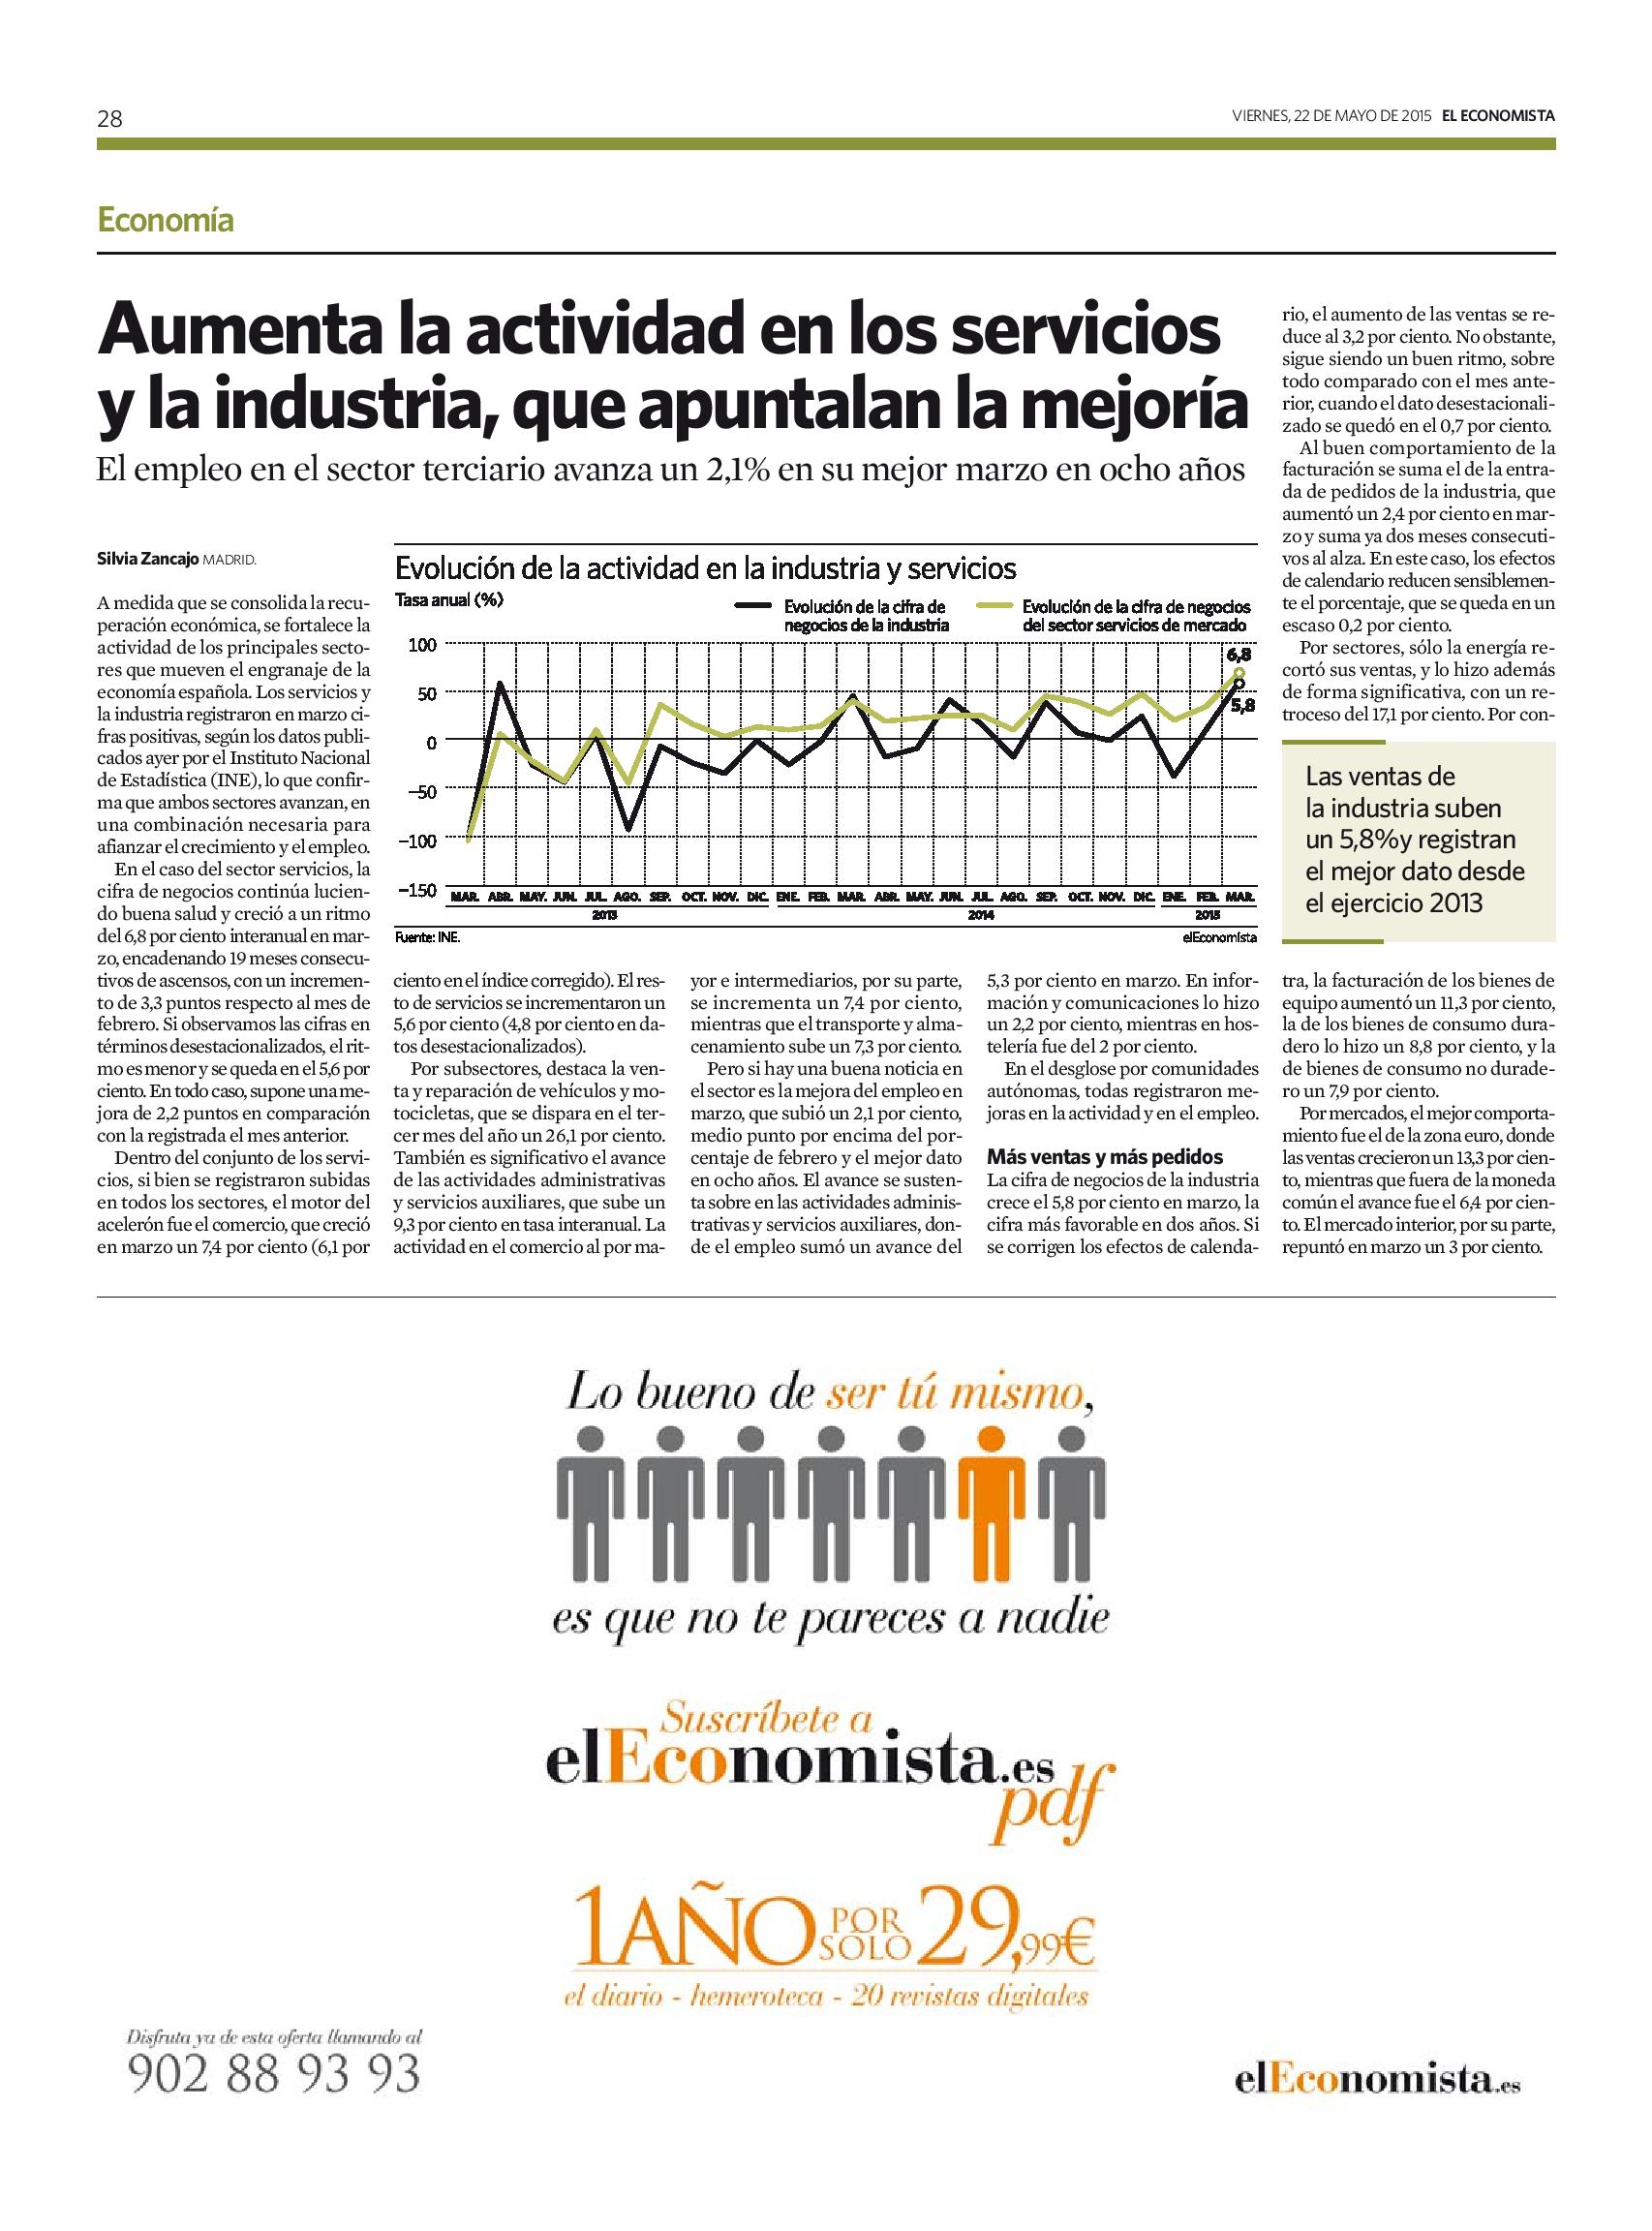 ElEconomista22052015_2-page-001